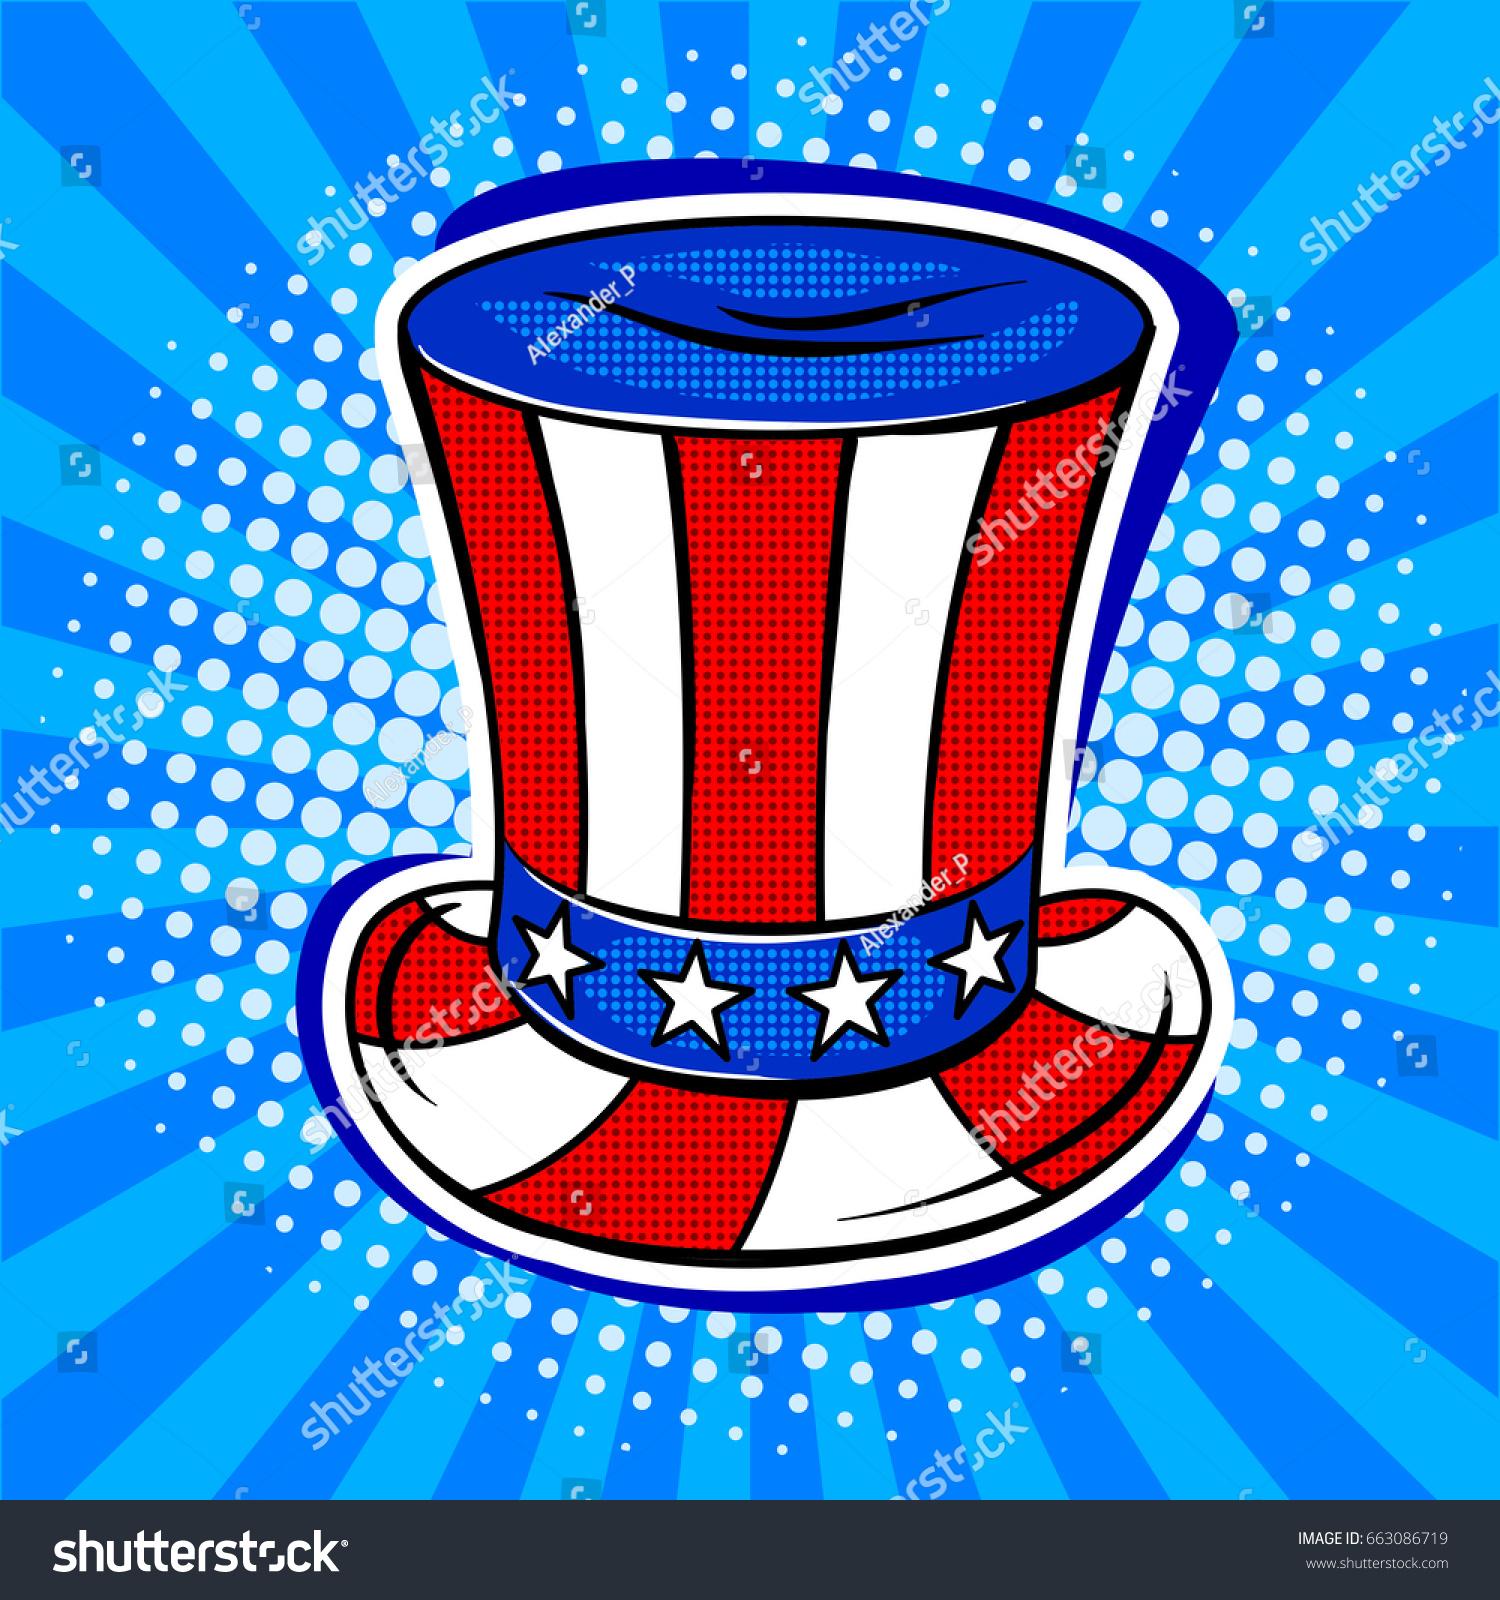 Hat Coloring American Flag Pop Art Stock Vector 663086719 - Shutterstock